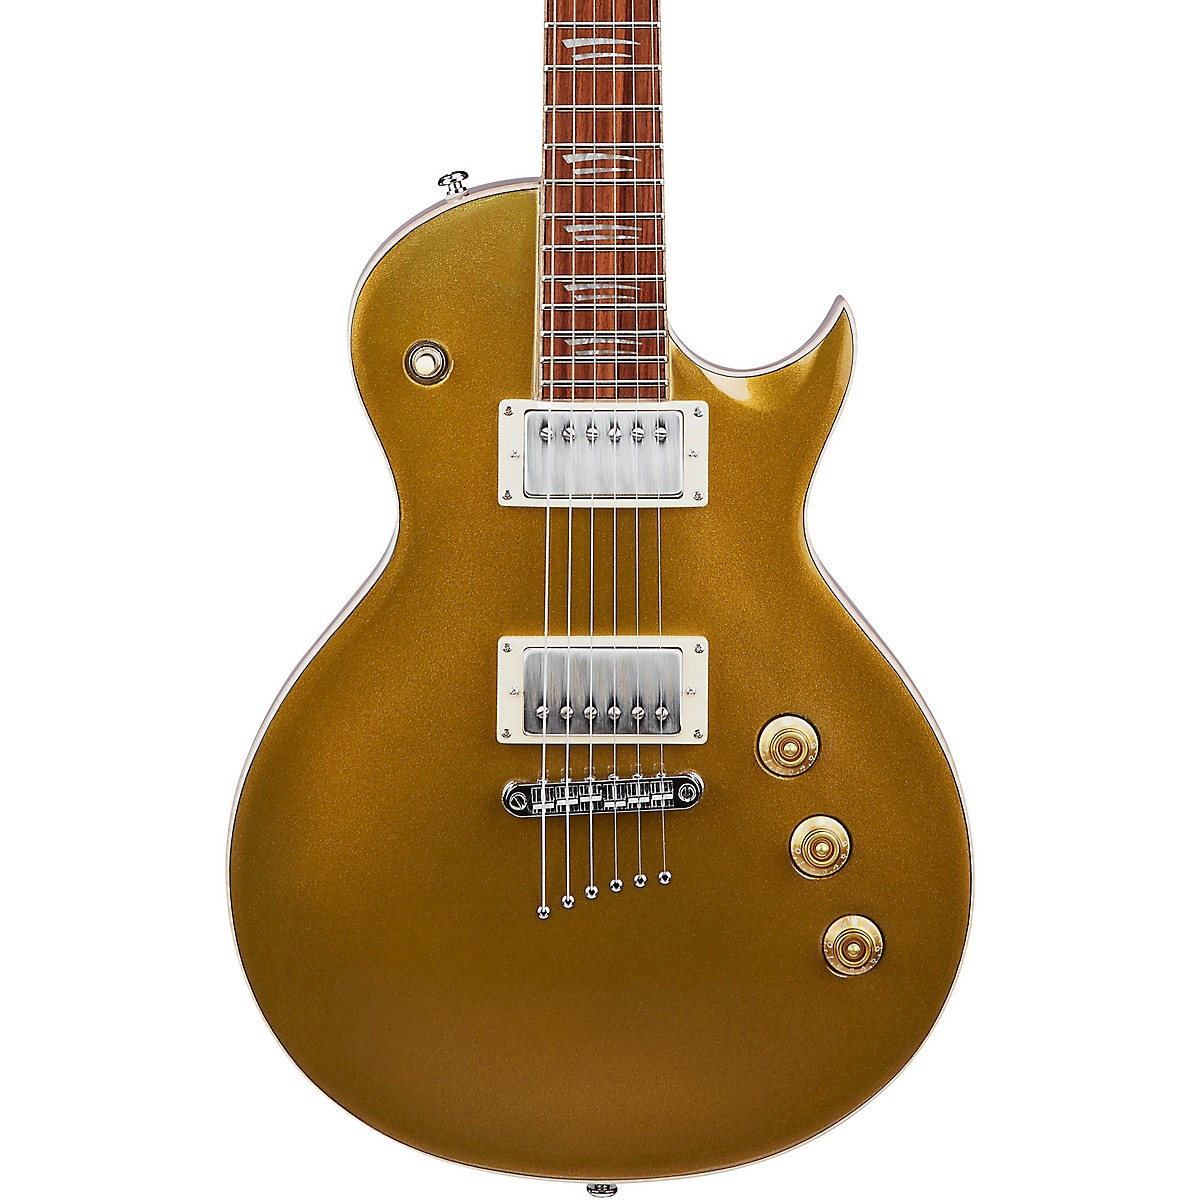 Mitchell MS450 Shallow Body Single Cutaway Electric Guitar